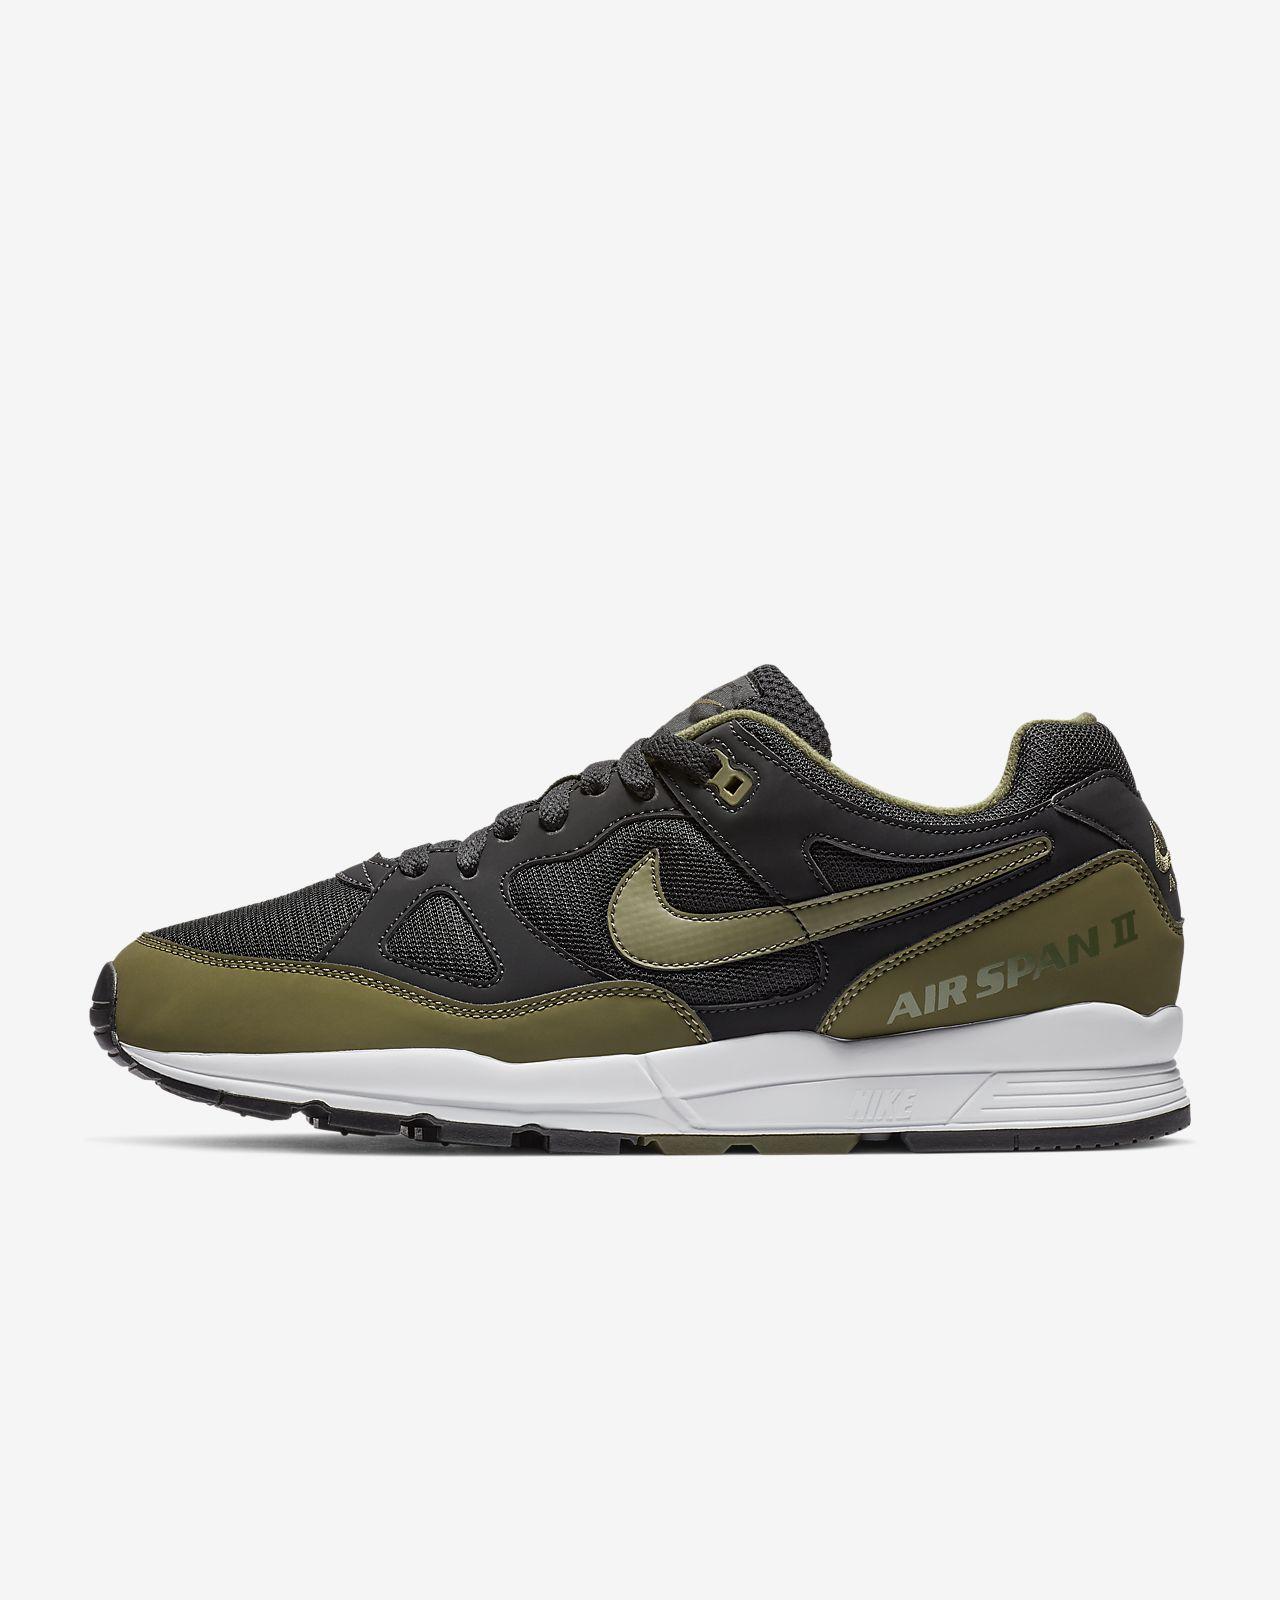 huge selection of f0012 0996f ... Nike Air Span II férficipő